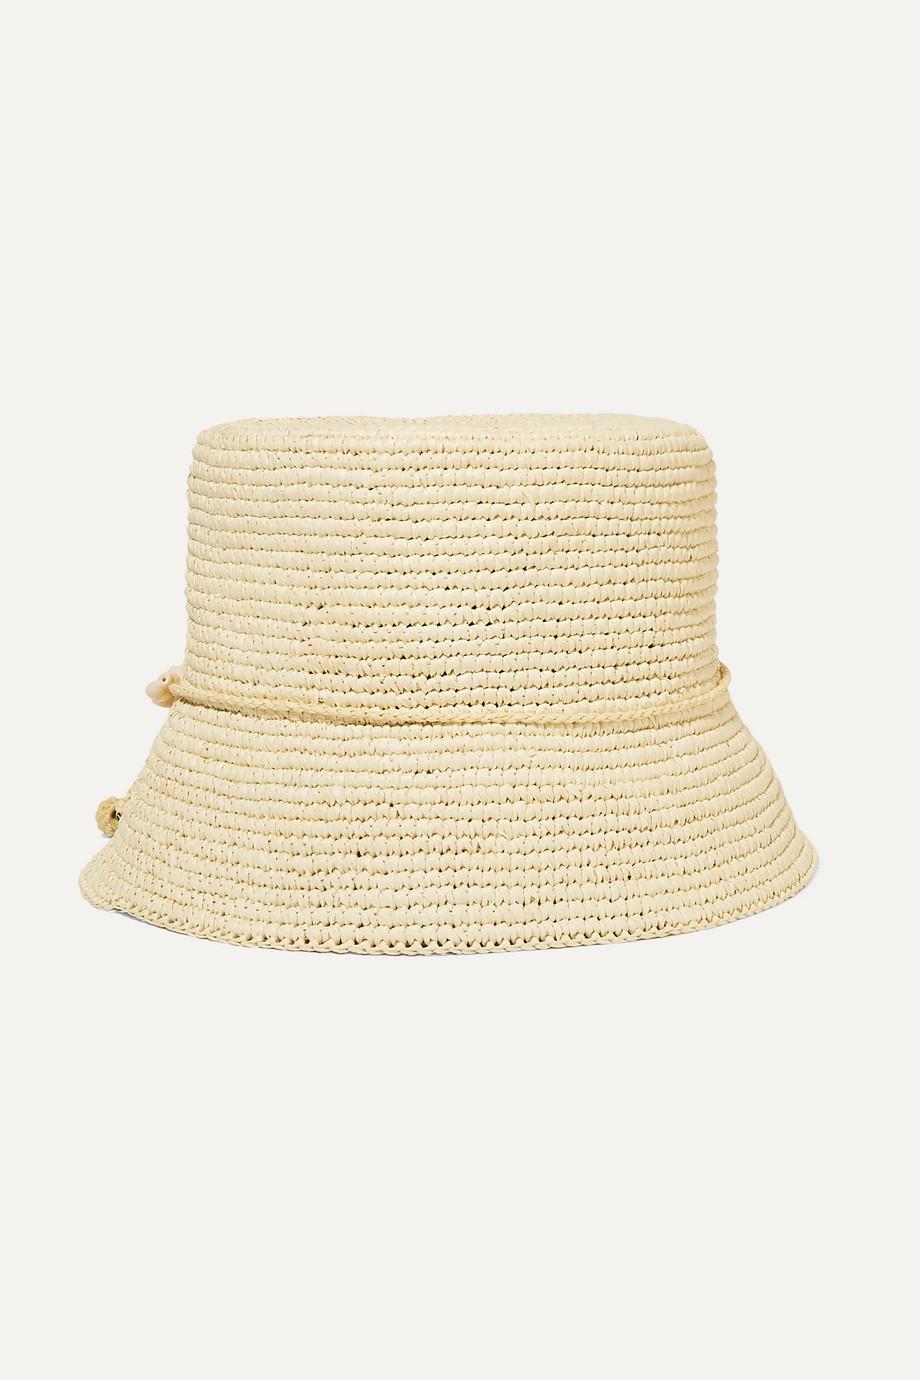 Sensi Studio Kids Verzierter Hut aus Toquilla-Stroh